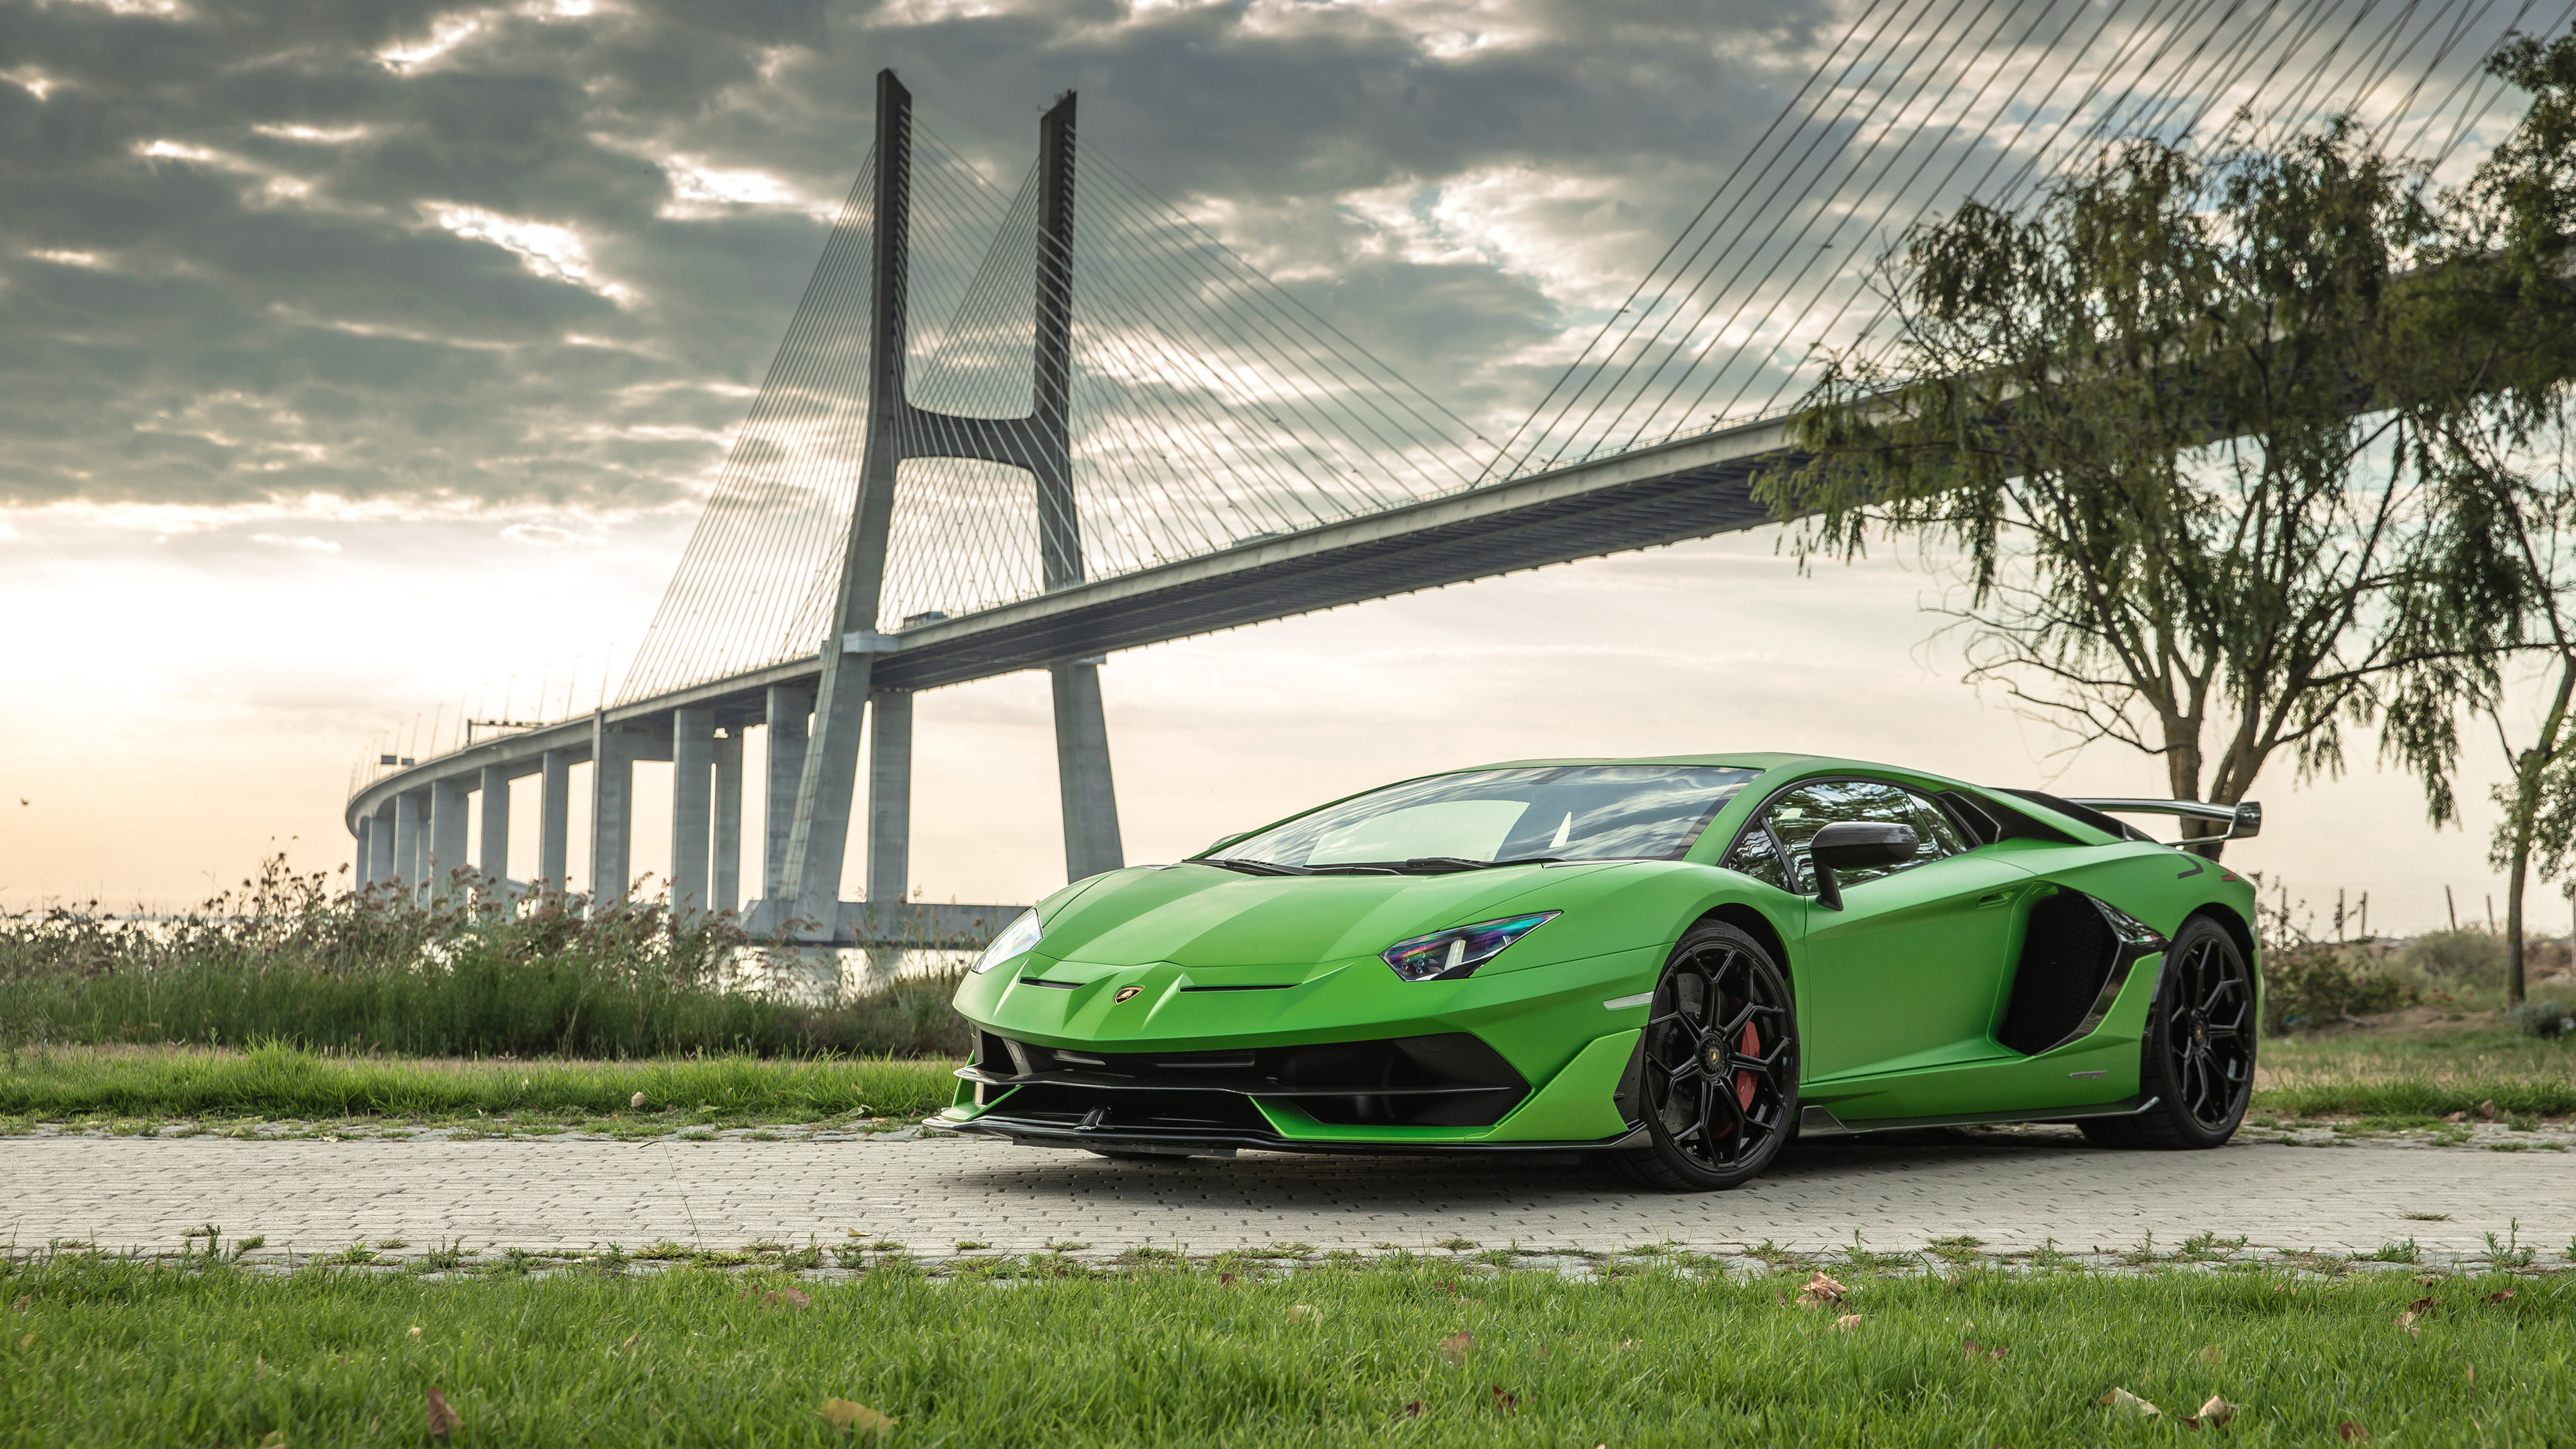 Wallpaper 4k Lamborghini Aventador Svj 2019 Front 2018 Cars